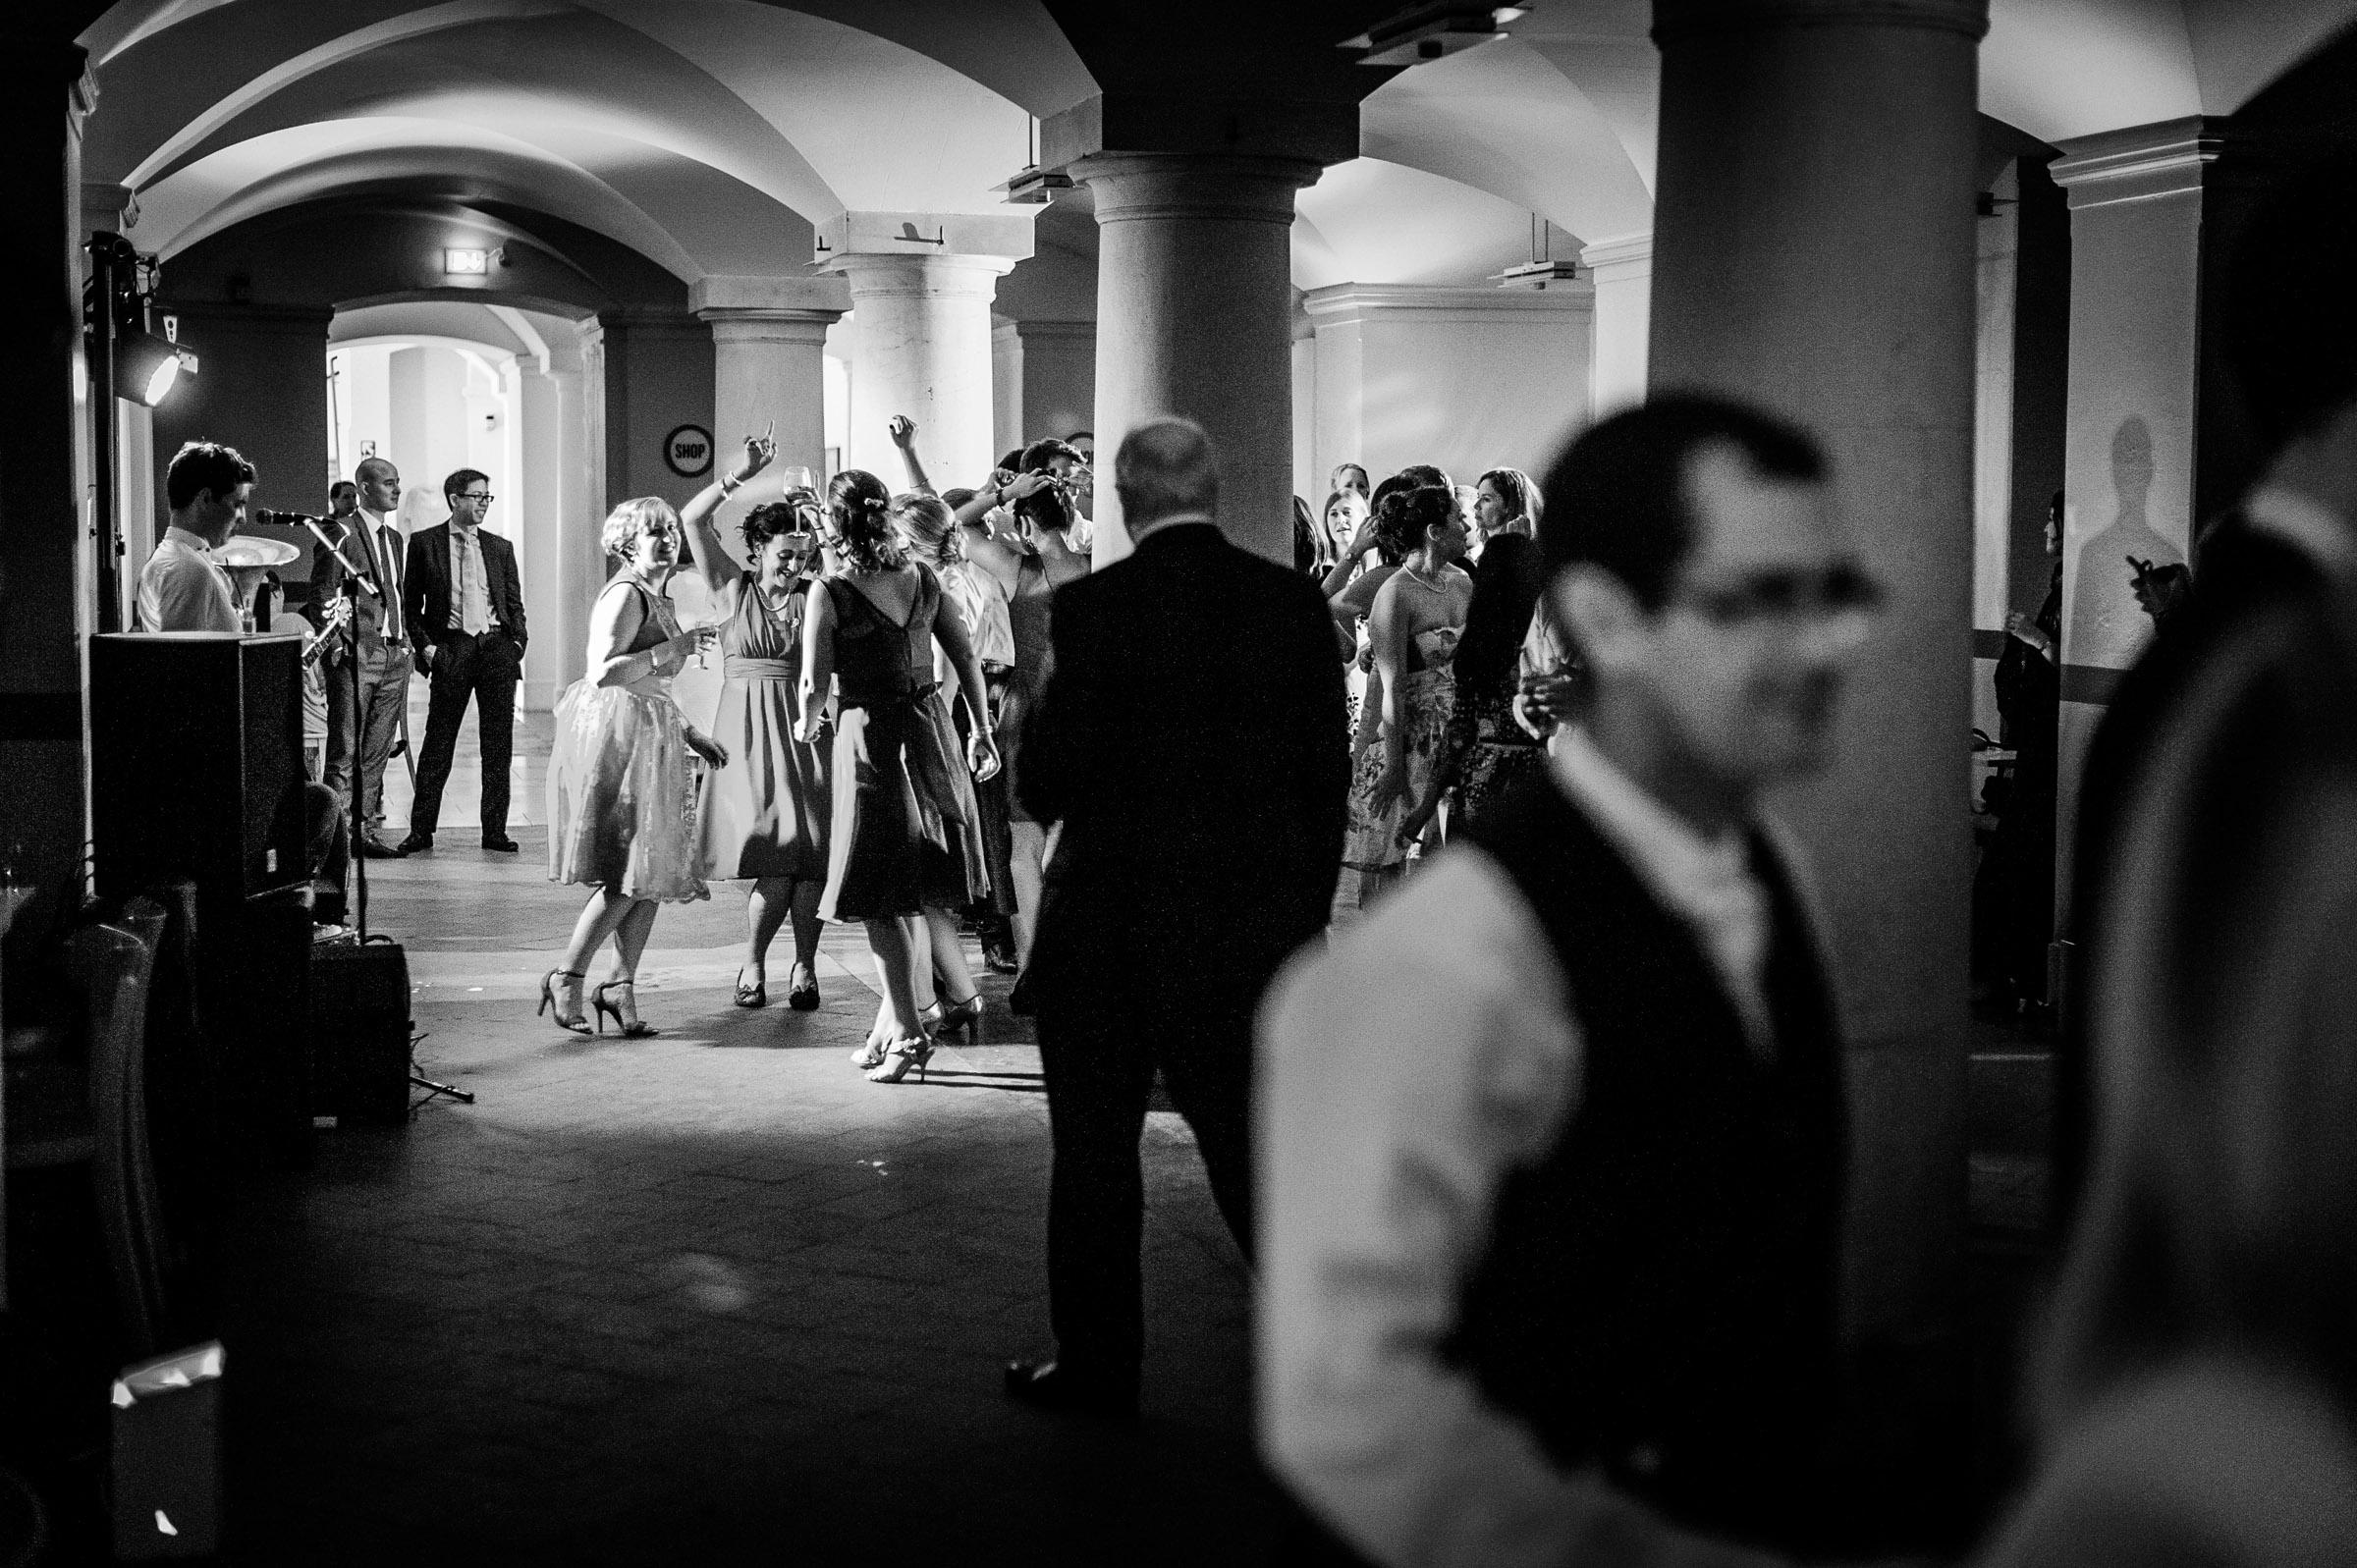 Ashmolean-Museum-Wedding-Pictures-0076.jpg